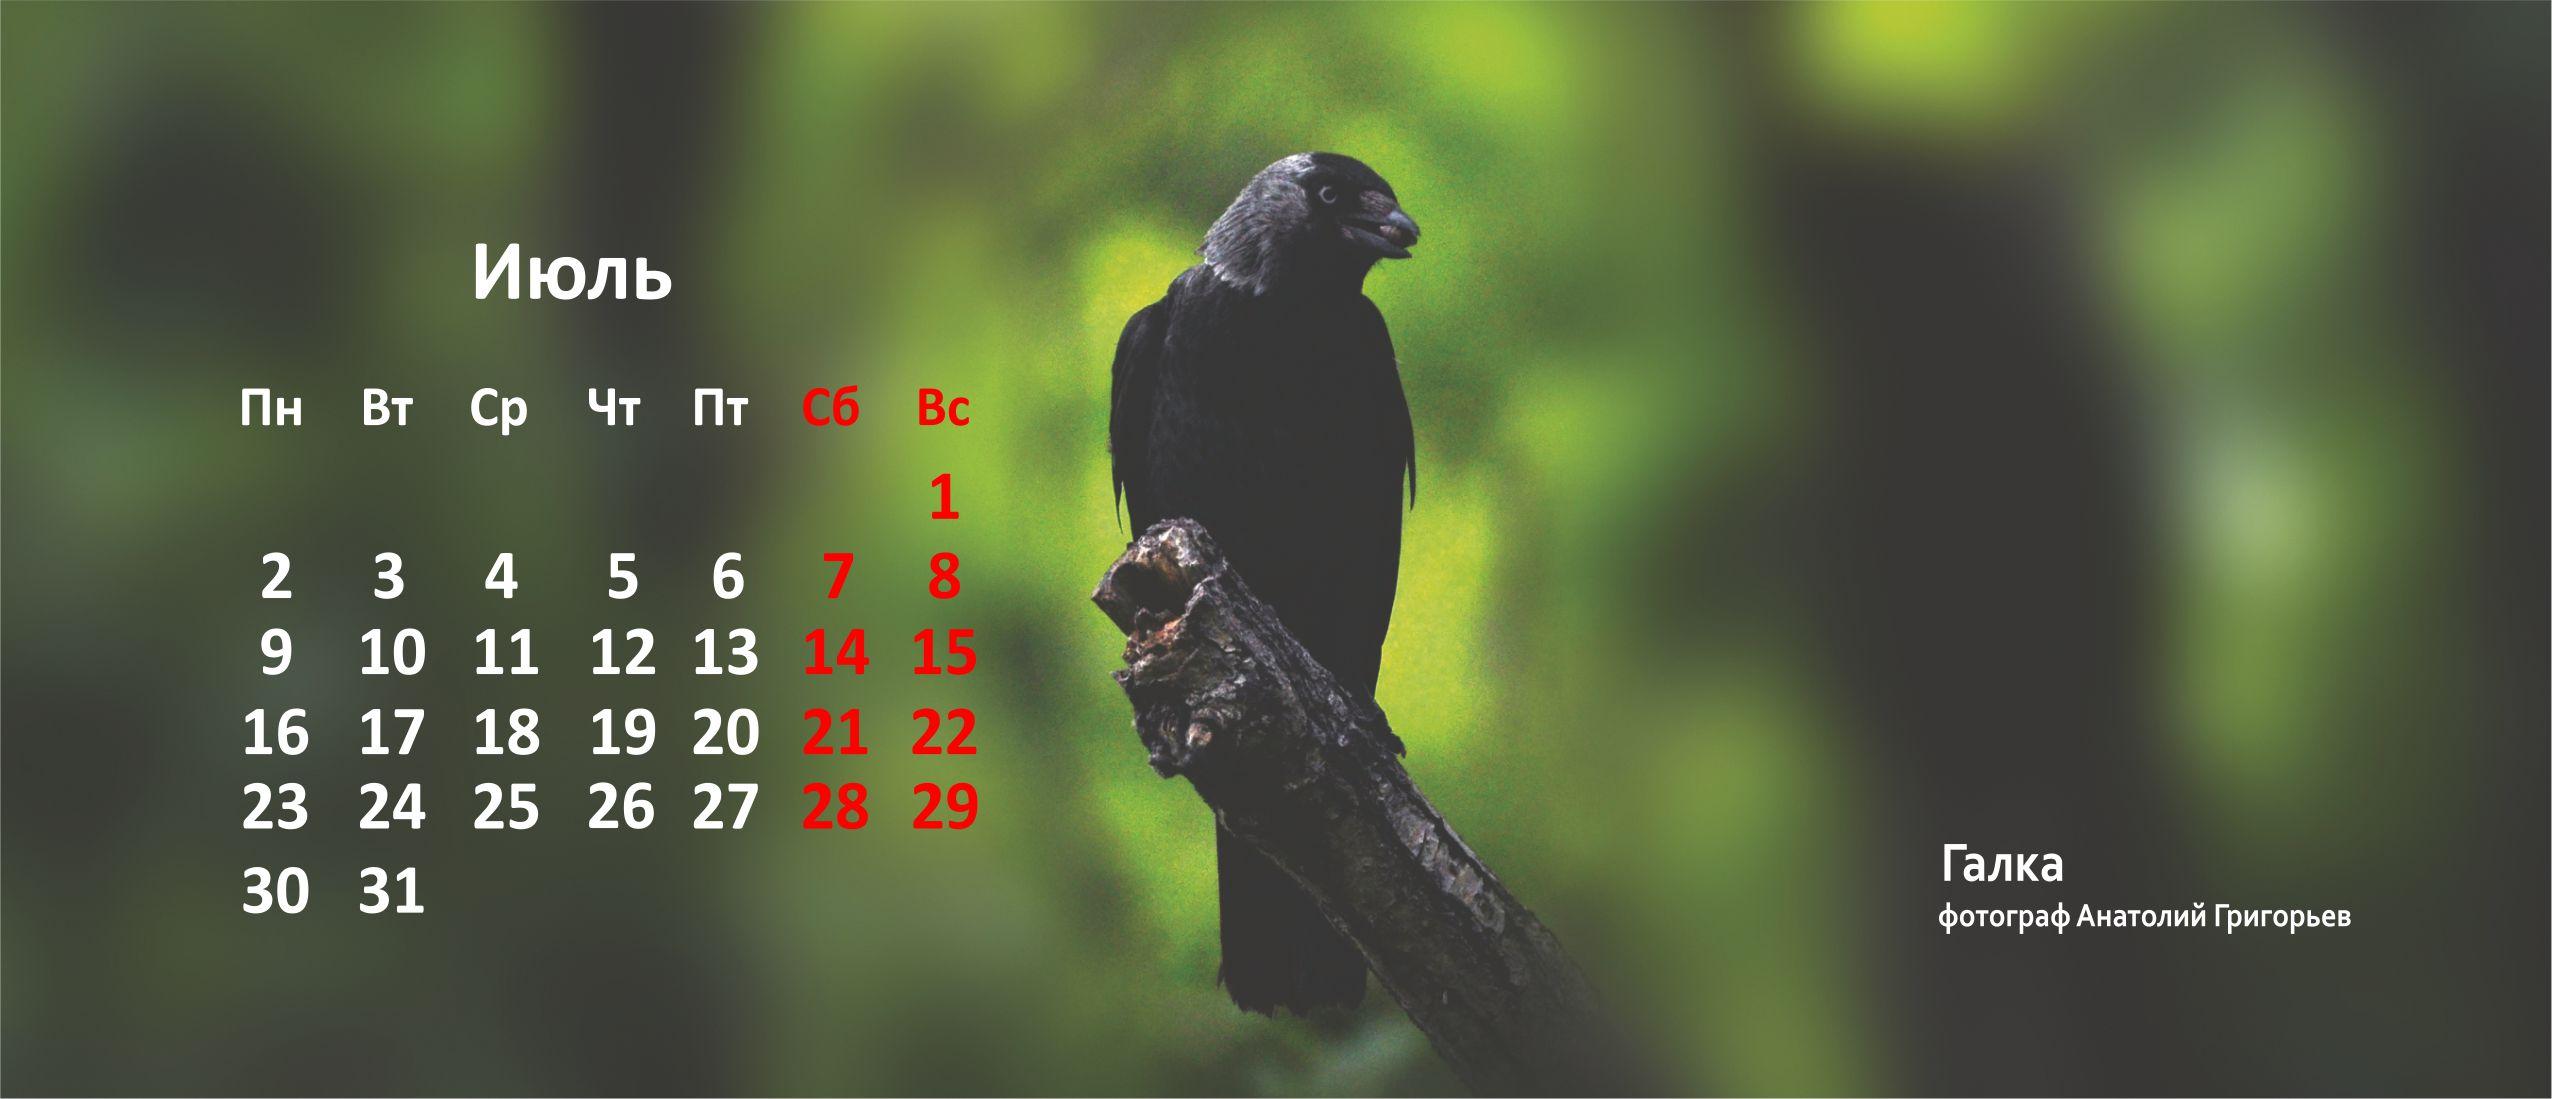 Галка Птицы Уфы 2018